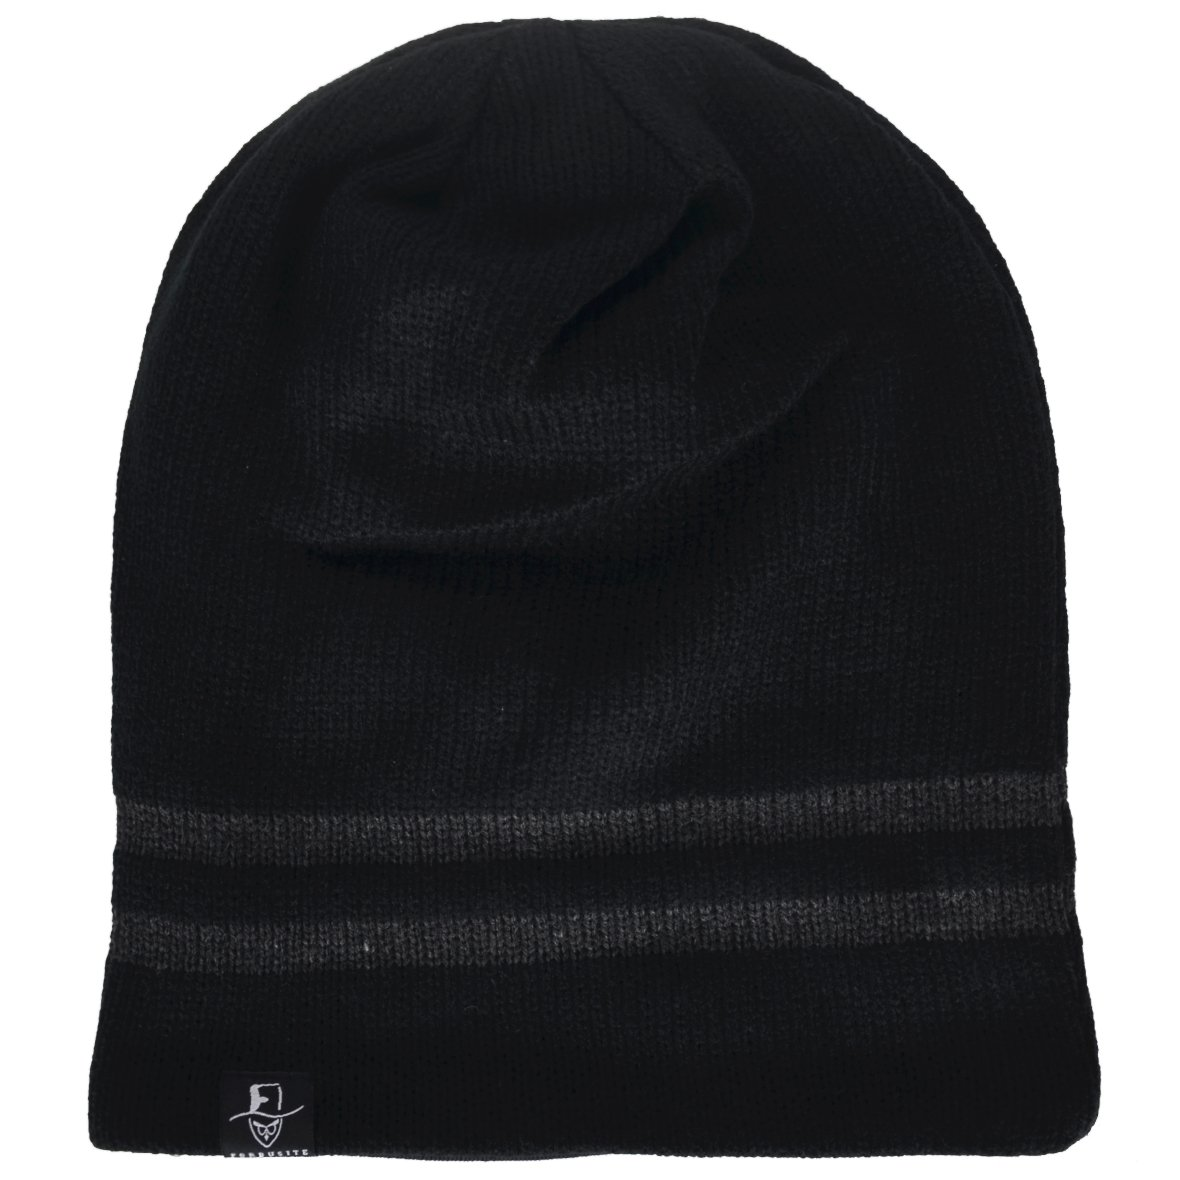 VECRY Mens Slouchy Beanie Knit Skull Cap Long Baggy Hip-hop Winter Summer Hat B305